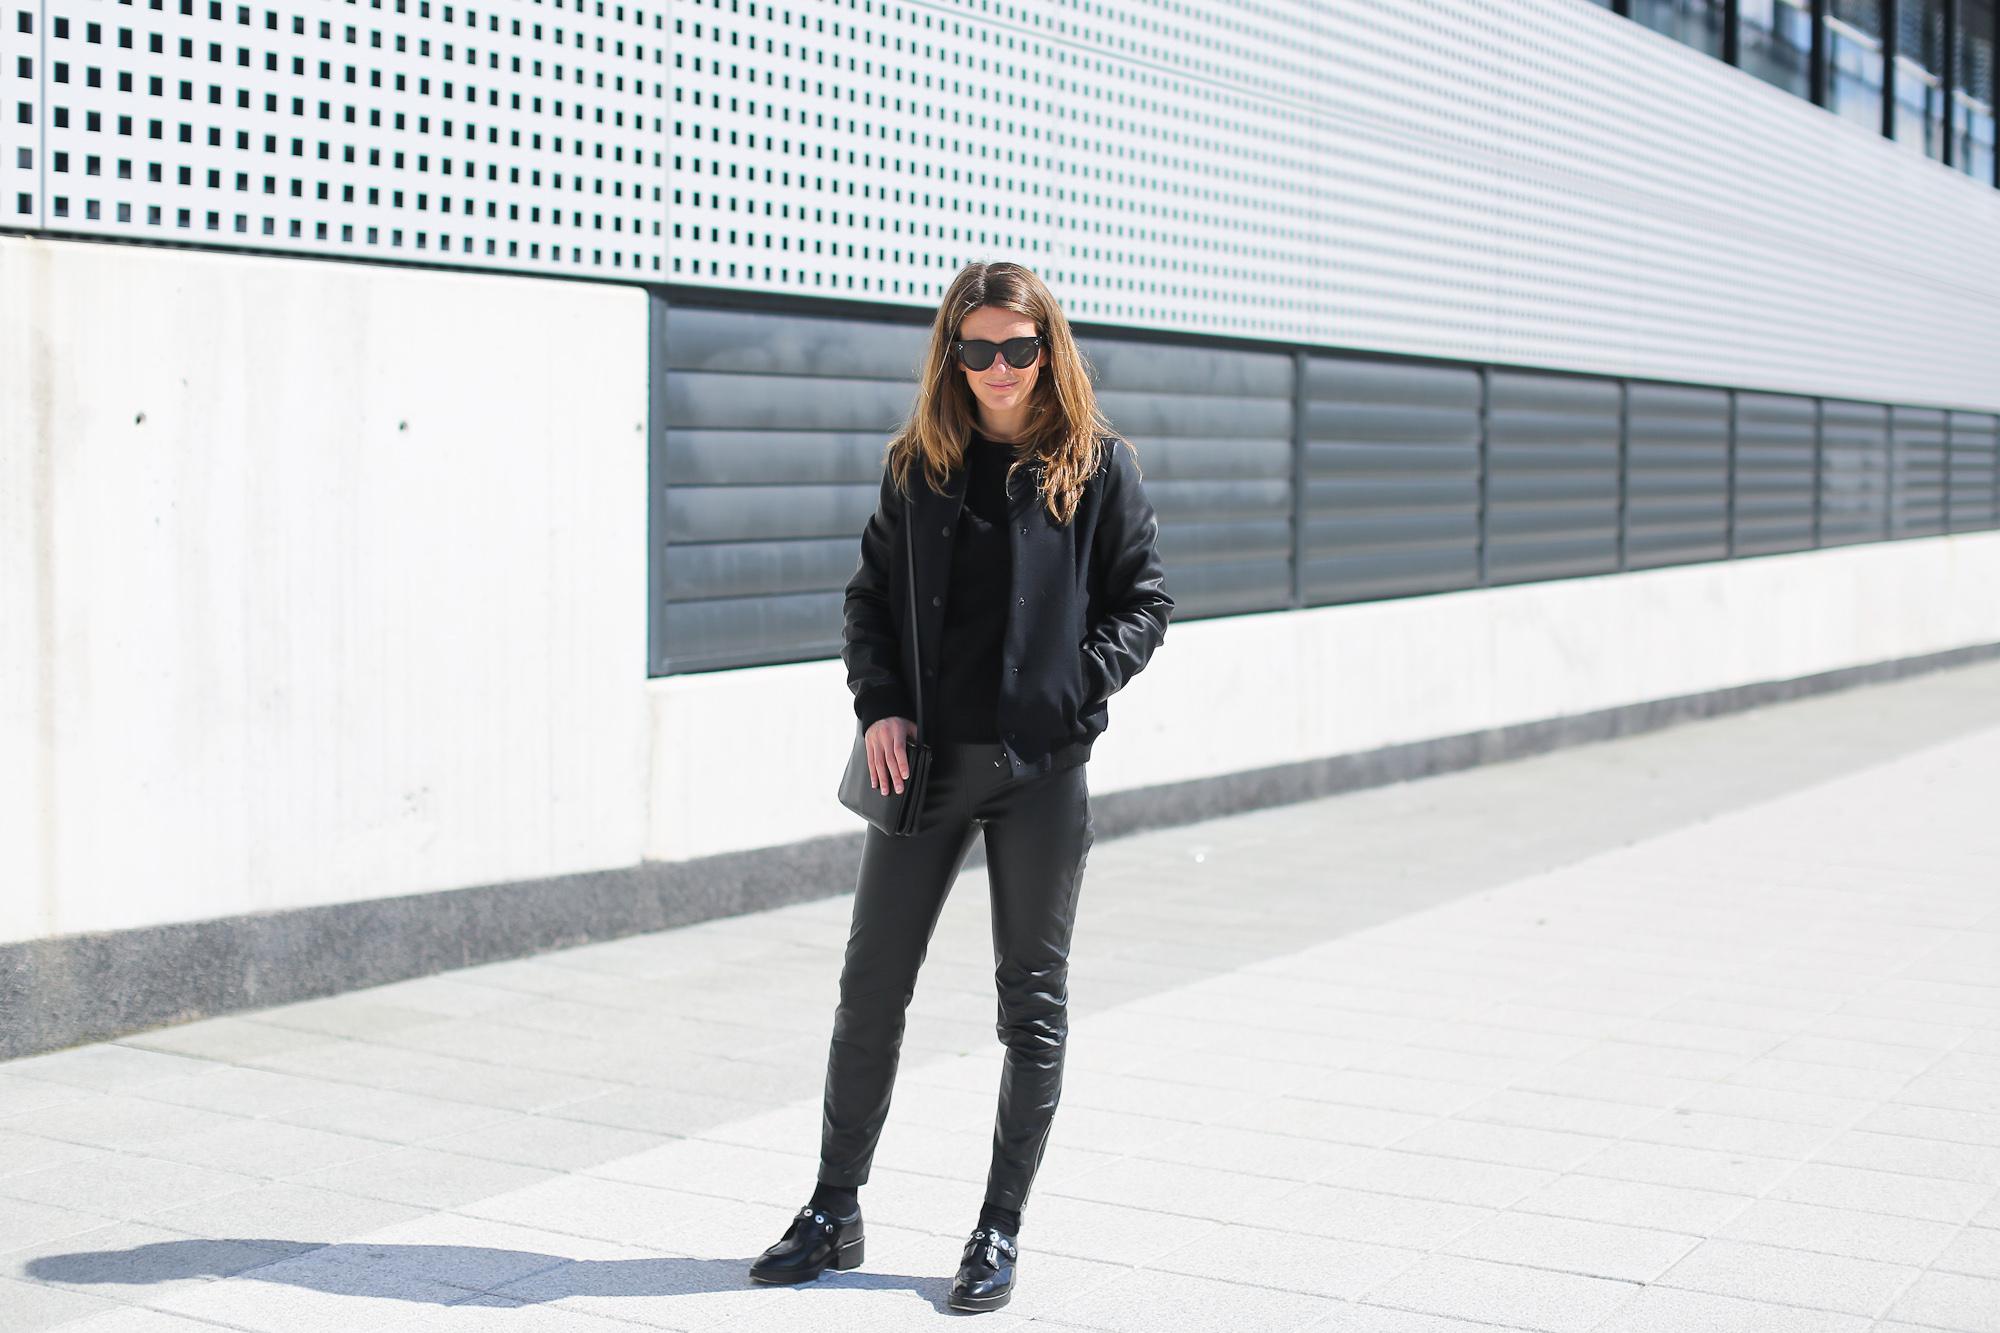 Clochet_streetstyle_pantalones_piel_suiteblanco_zapatos_planos_sandro-3